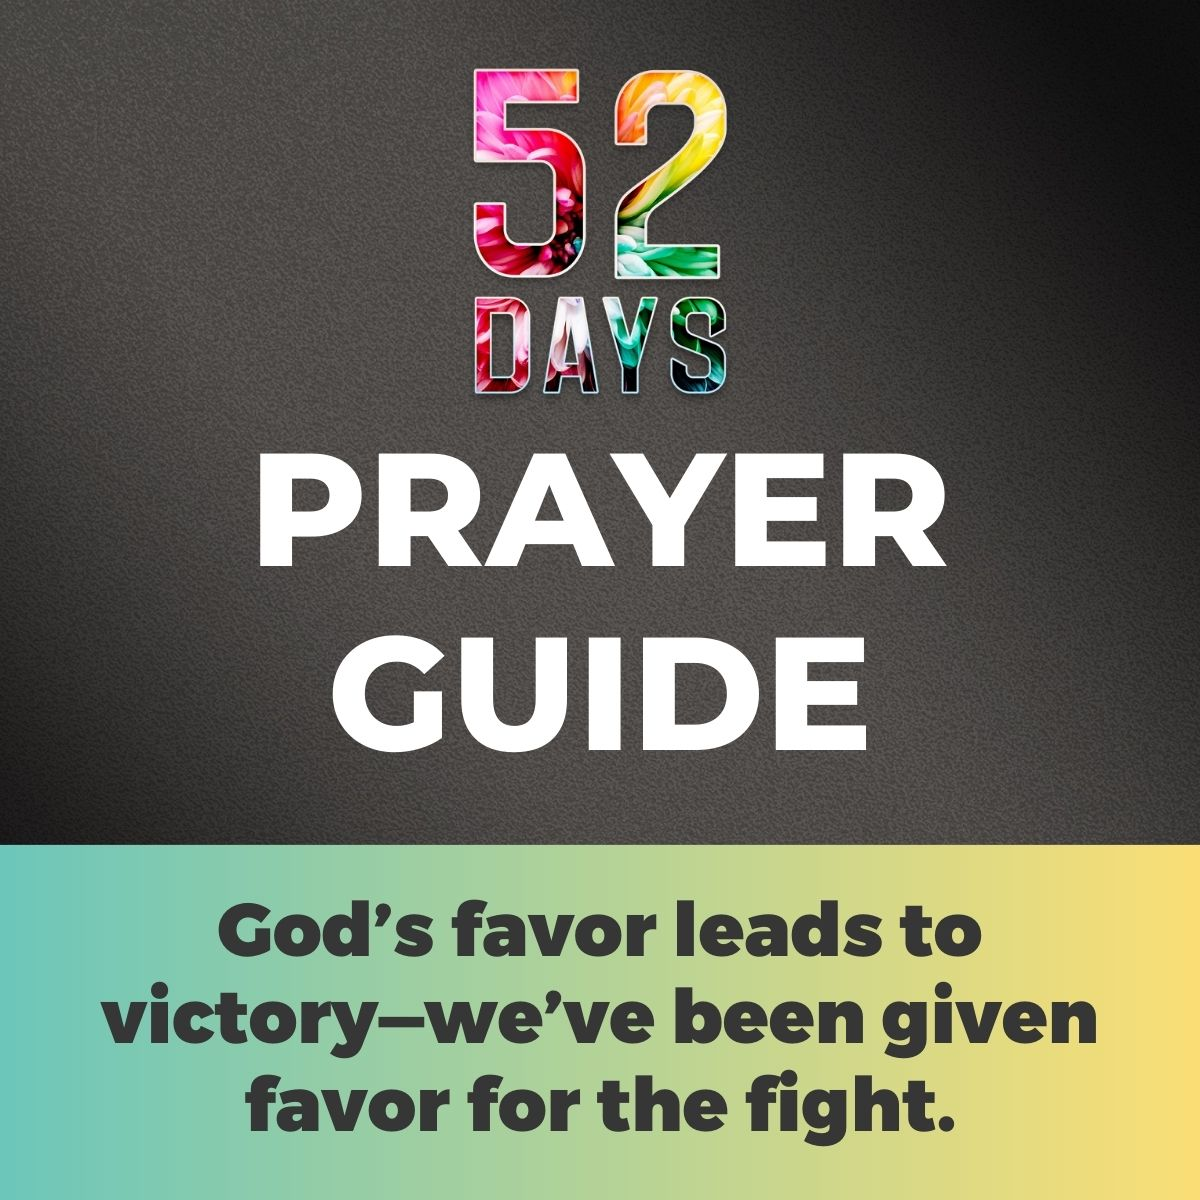 52_PrayerGuide_TILES_3